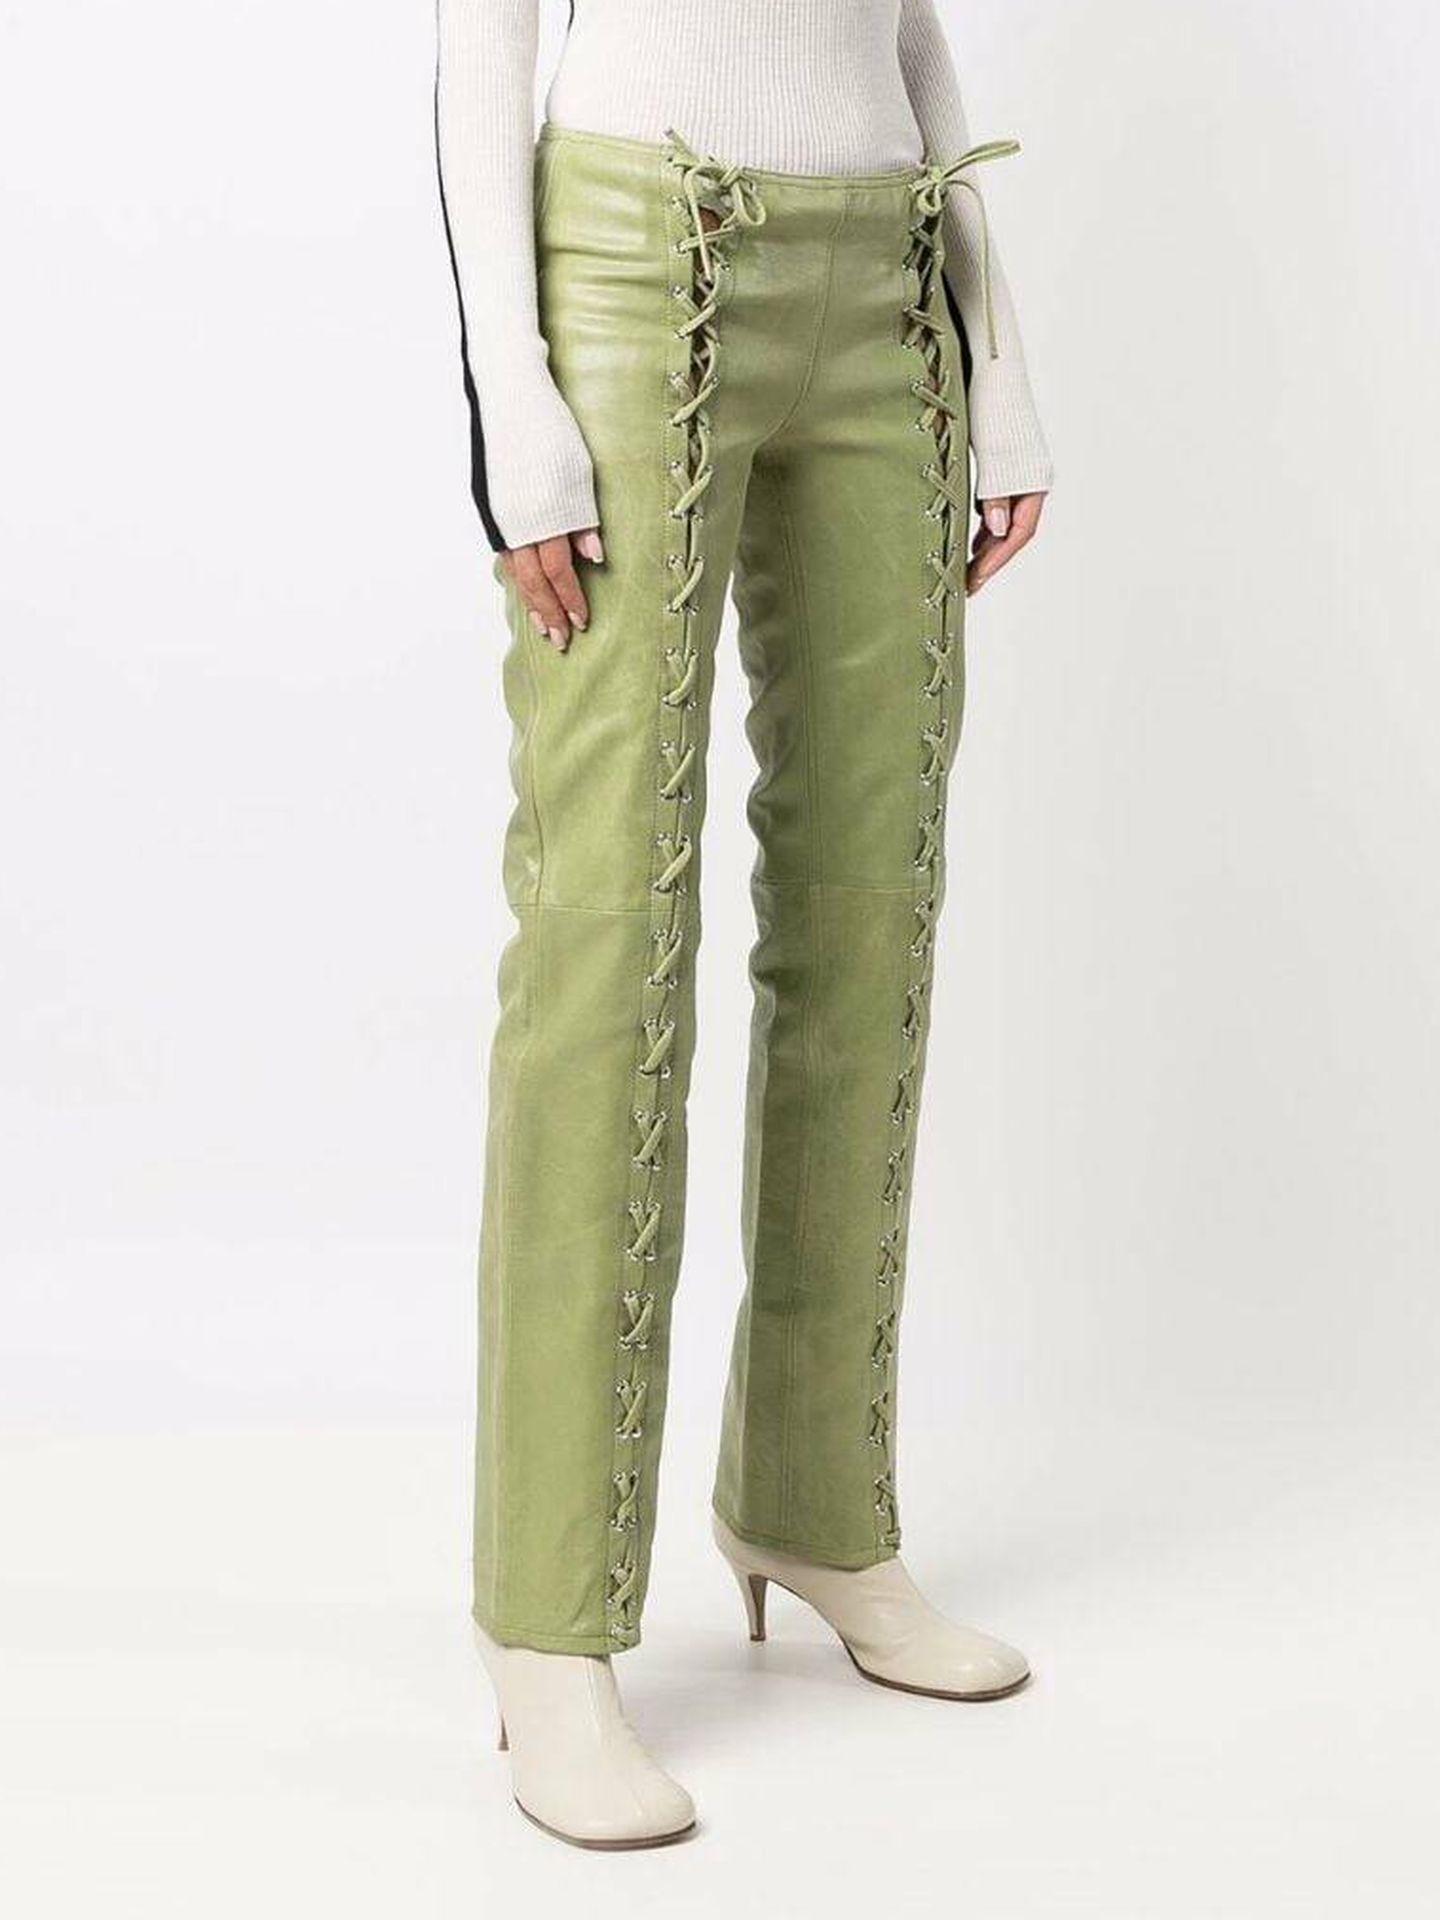 Pantalón Christina de la marca Saks Potts. (Cortesía)